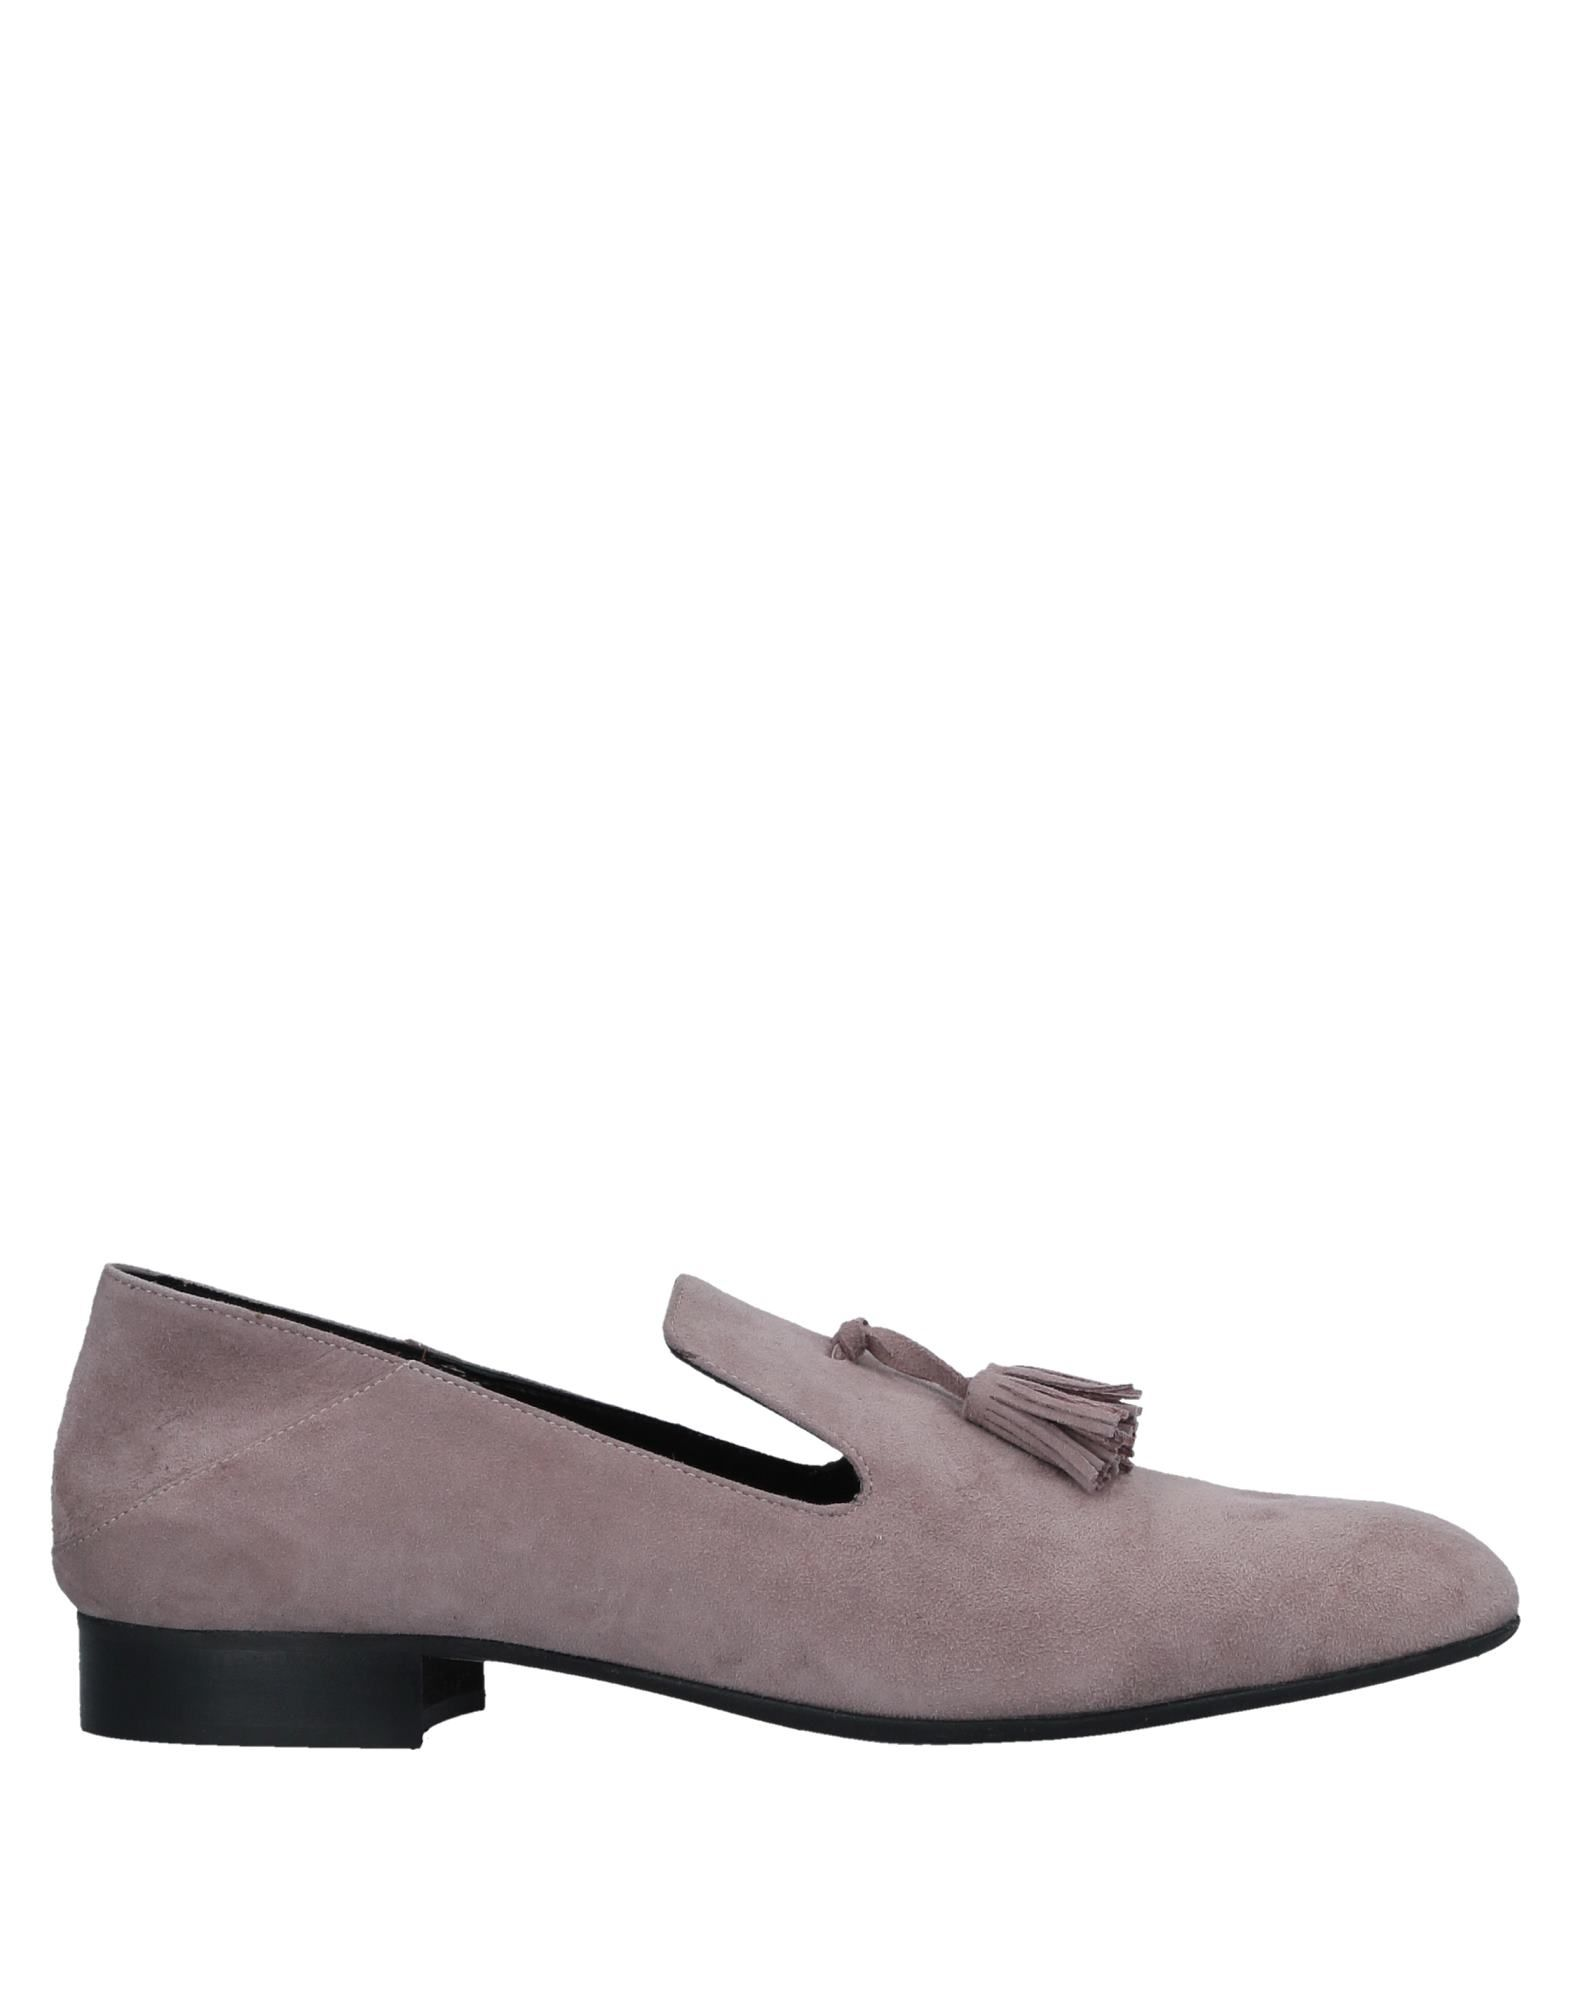 Lea 11519337VJ Gute Qualität beliebte Schuhe